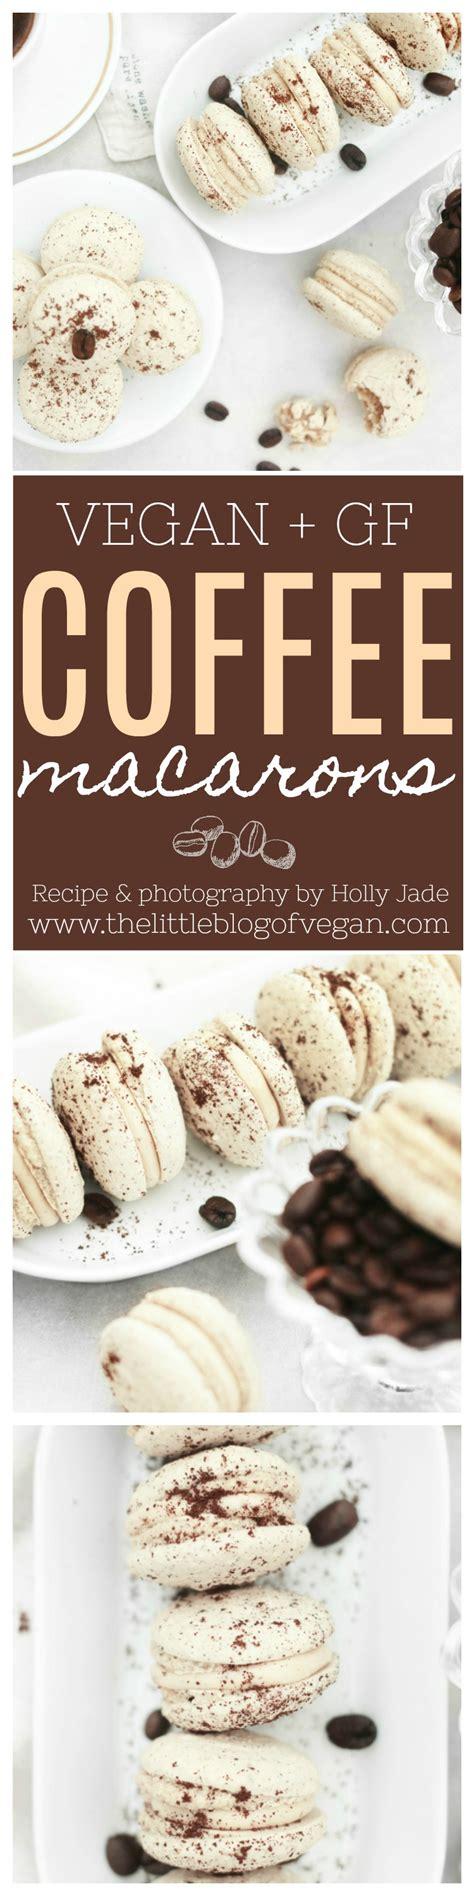 Vegan macarons made with aquafaba instead of egg whites. Vegan coffee macarons recipe | Macaron recipe, Vegan desserts, Food recipes